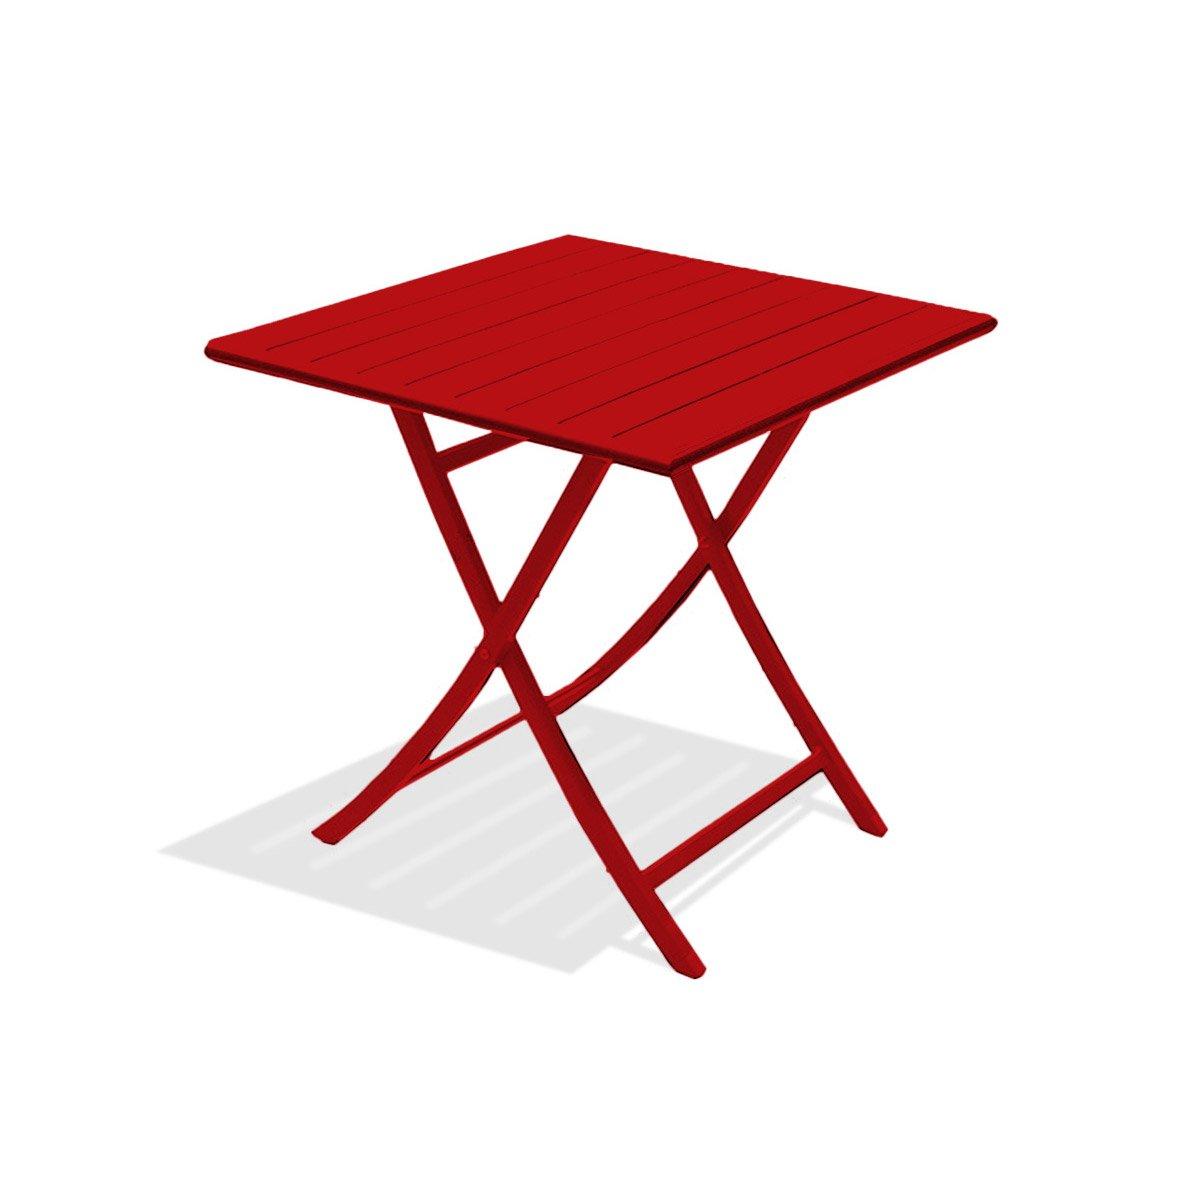 table de jardin marius carr e rouge carmin 2 personnes. Black Bedroom Furniture Sets. Home Design Ideas